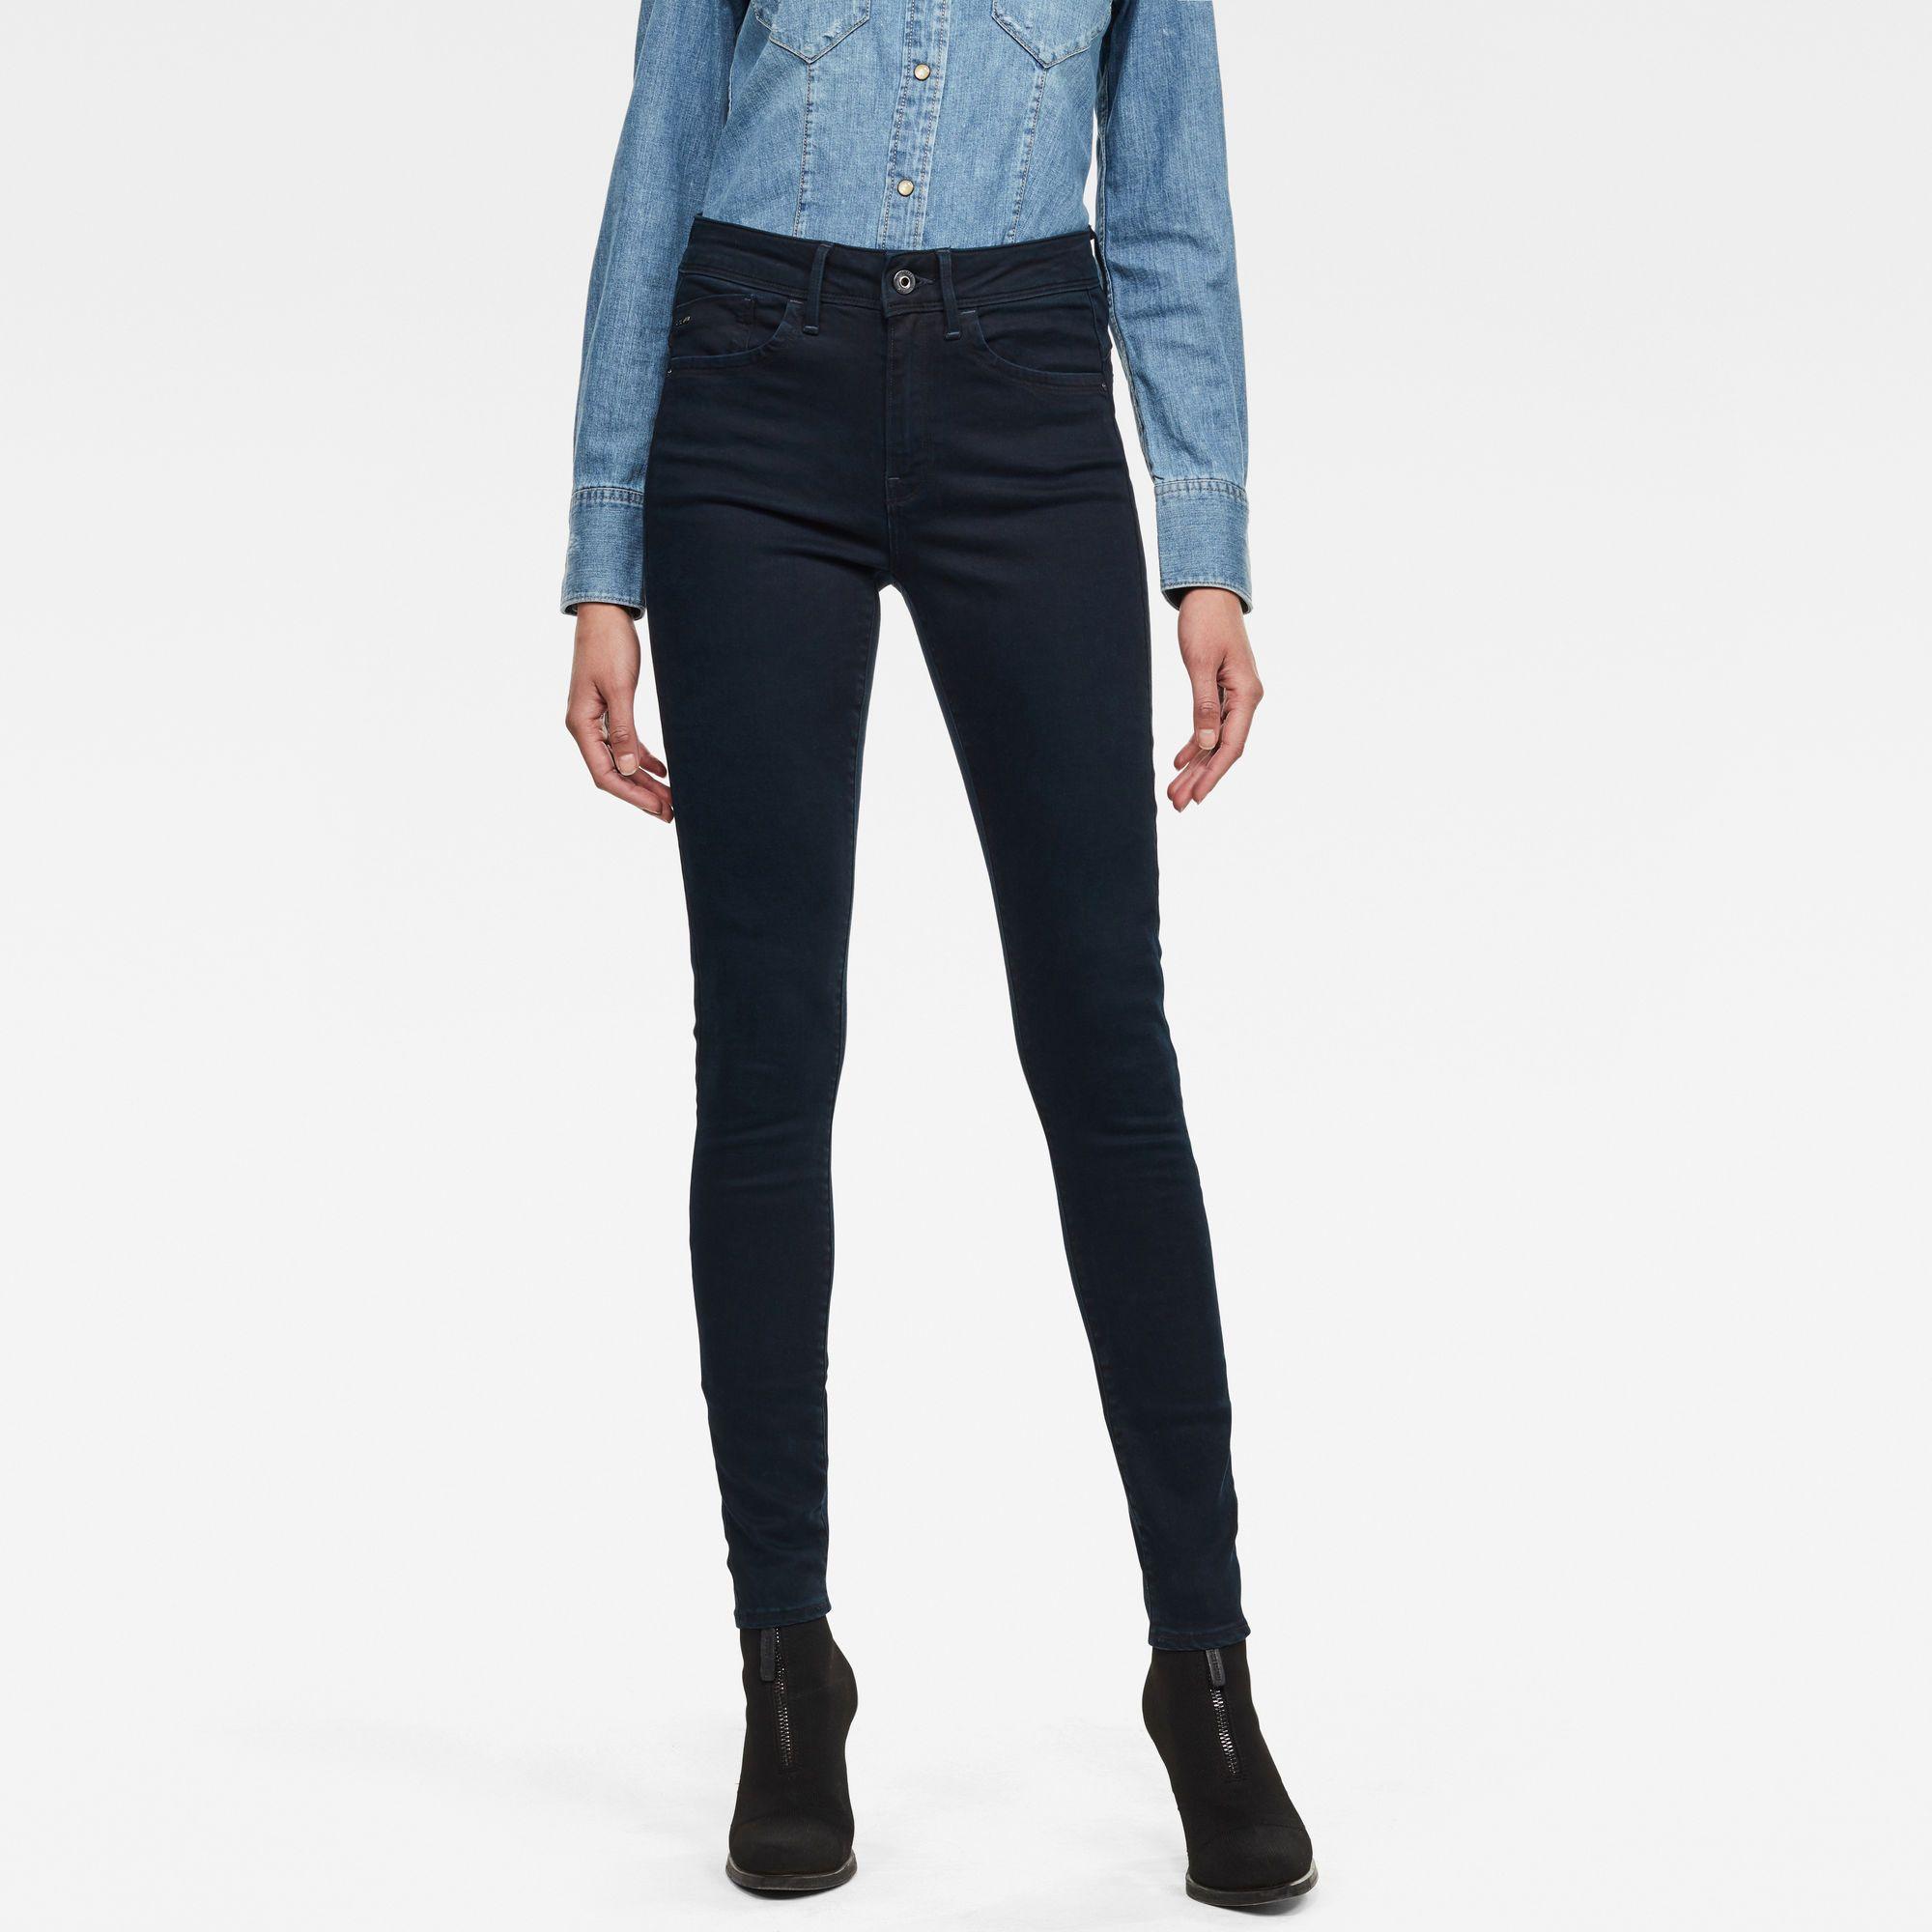 G-Star RAW Lhana High Super Skinny Jeans